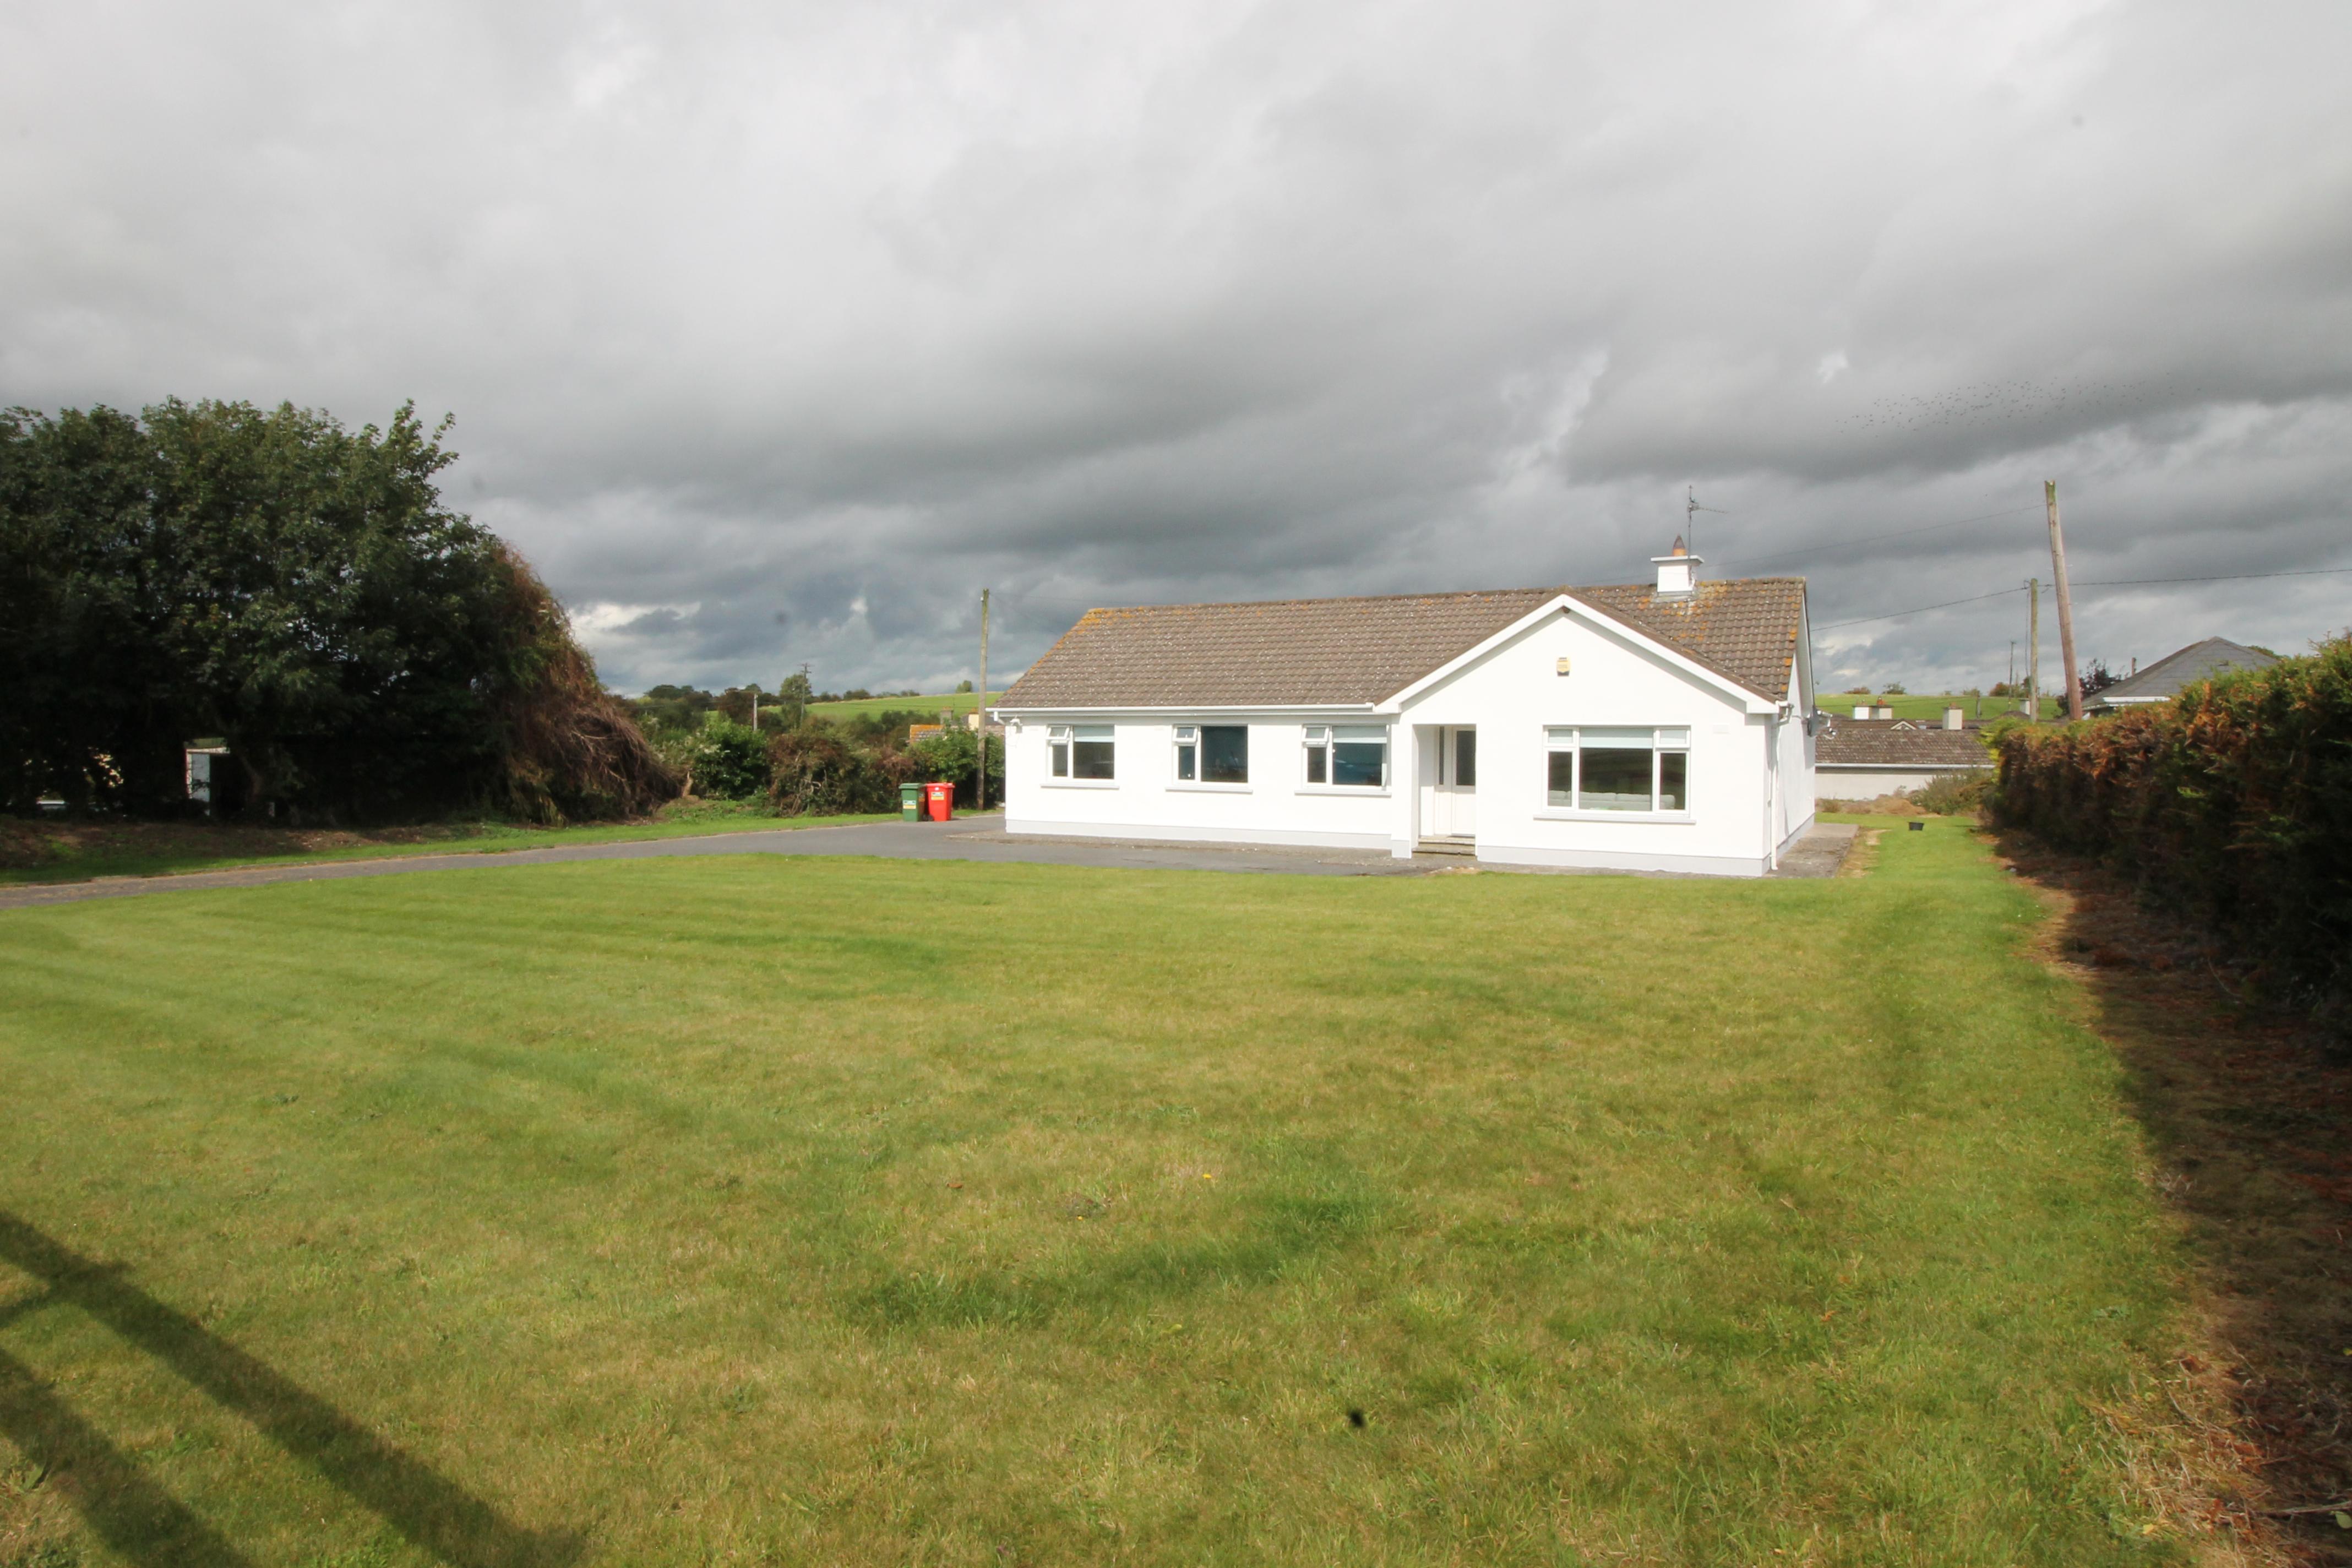 Castlequarter, Ardfinnan, Co. Tipperary